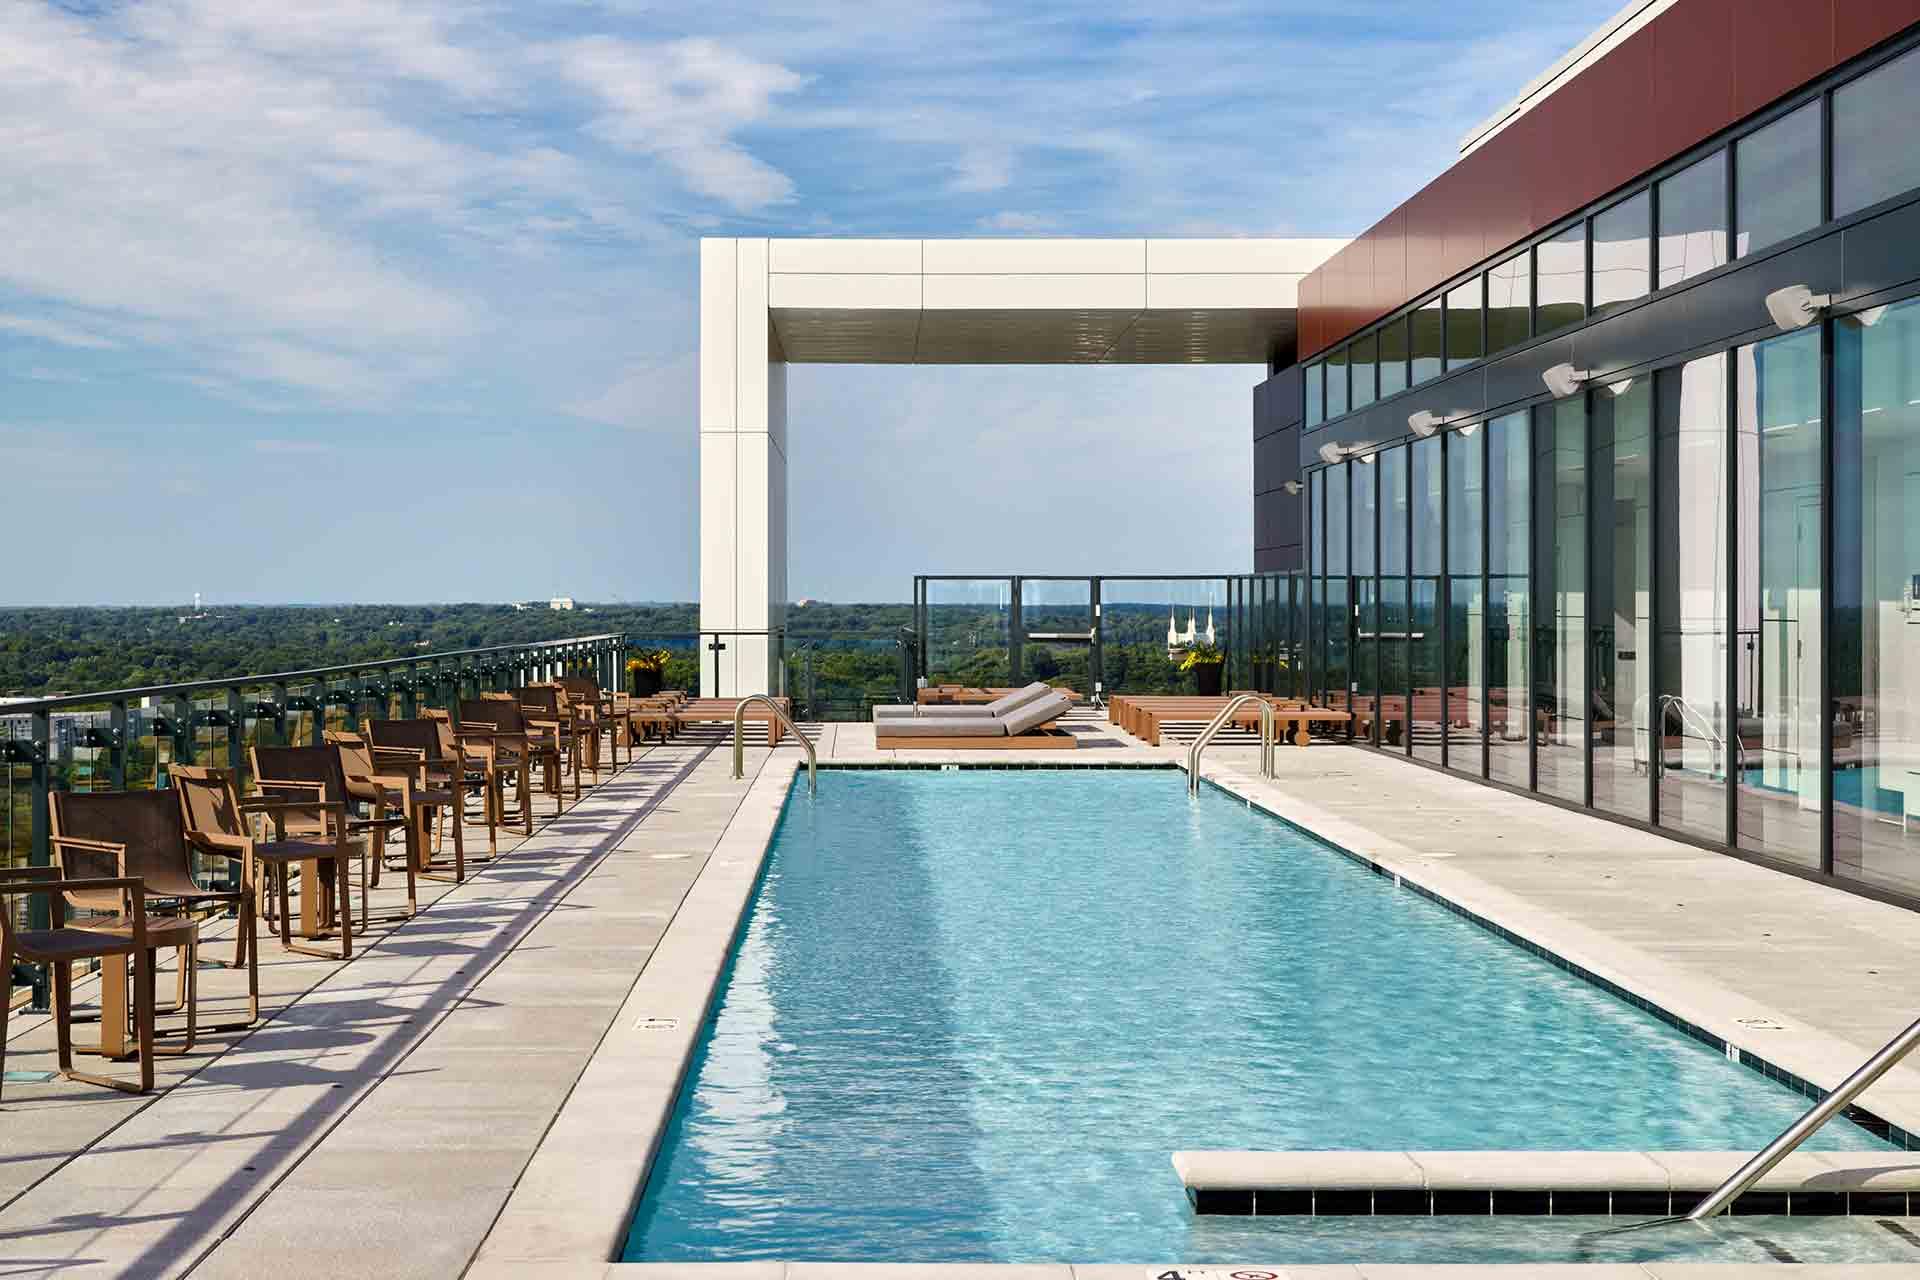 Rooftop pool at 7770 Norfolk, Bethesda, MD